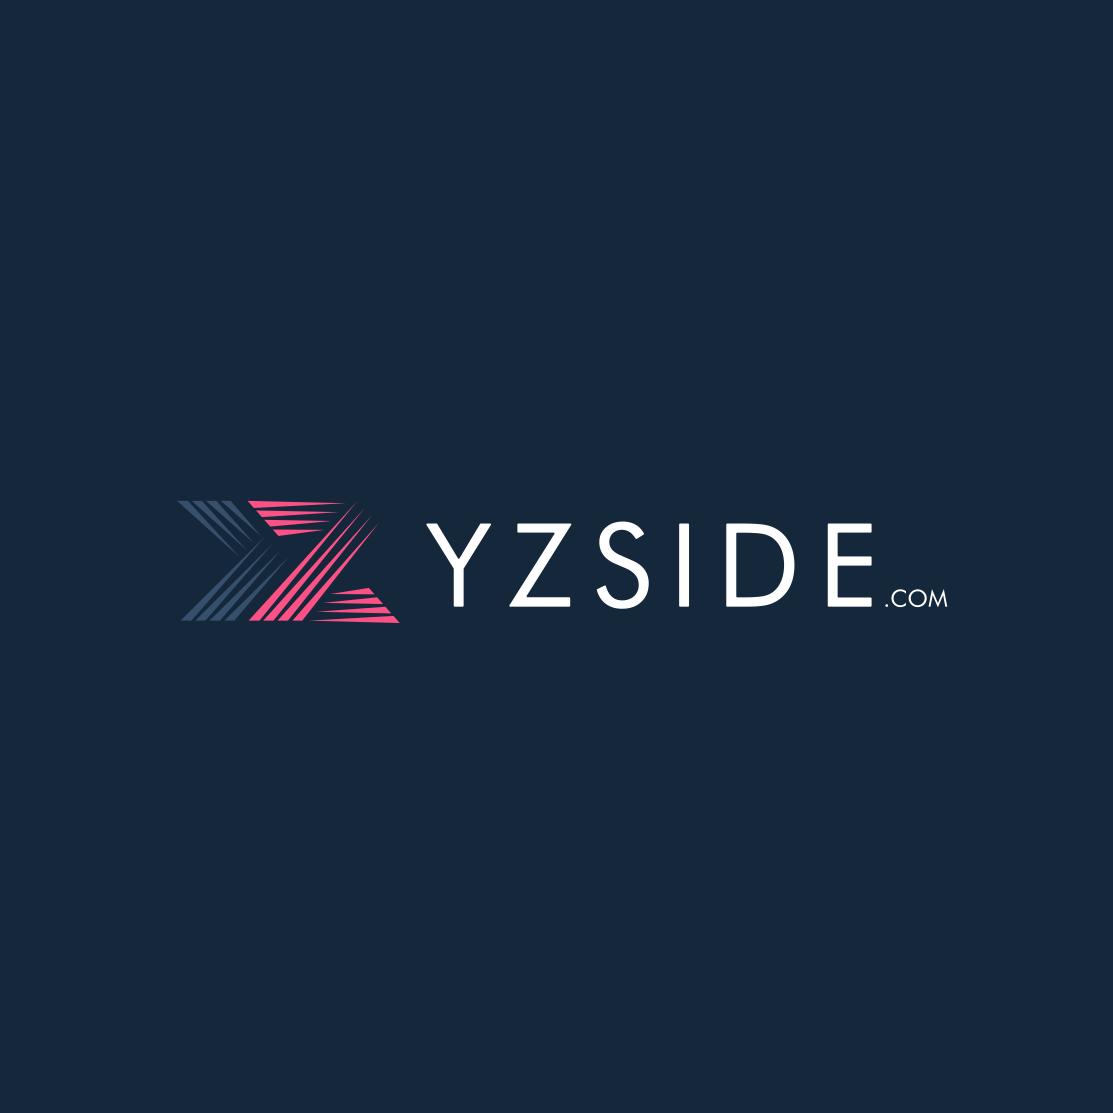 YZSIDE logo